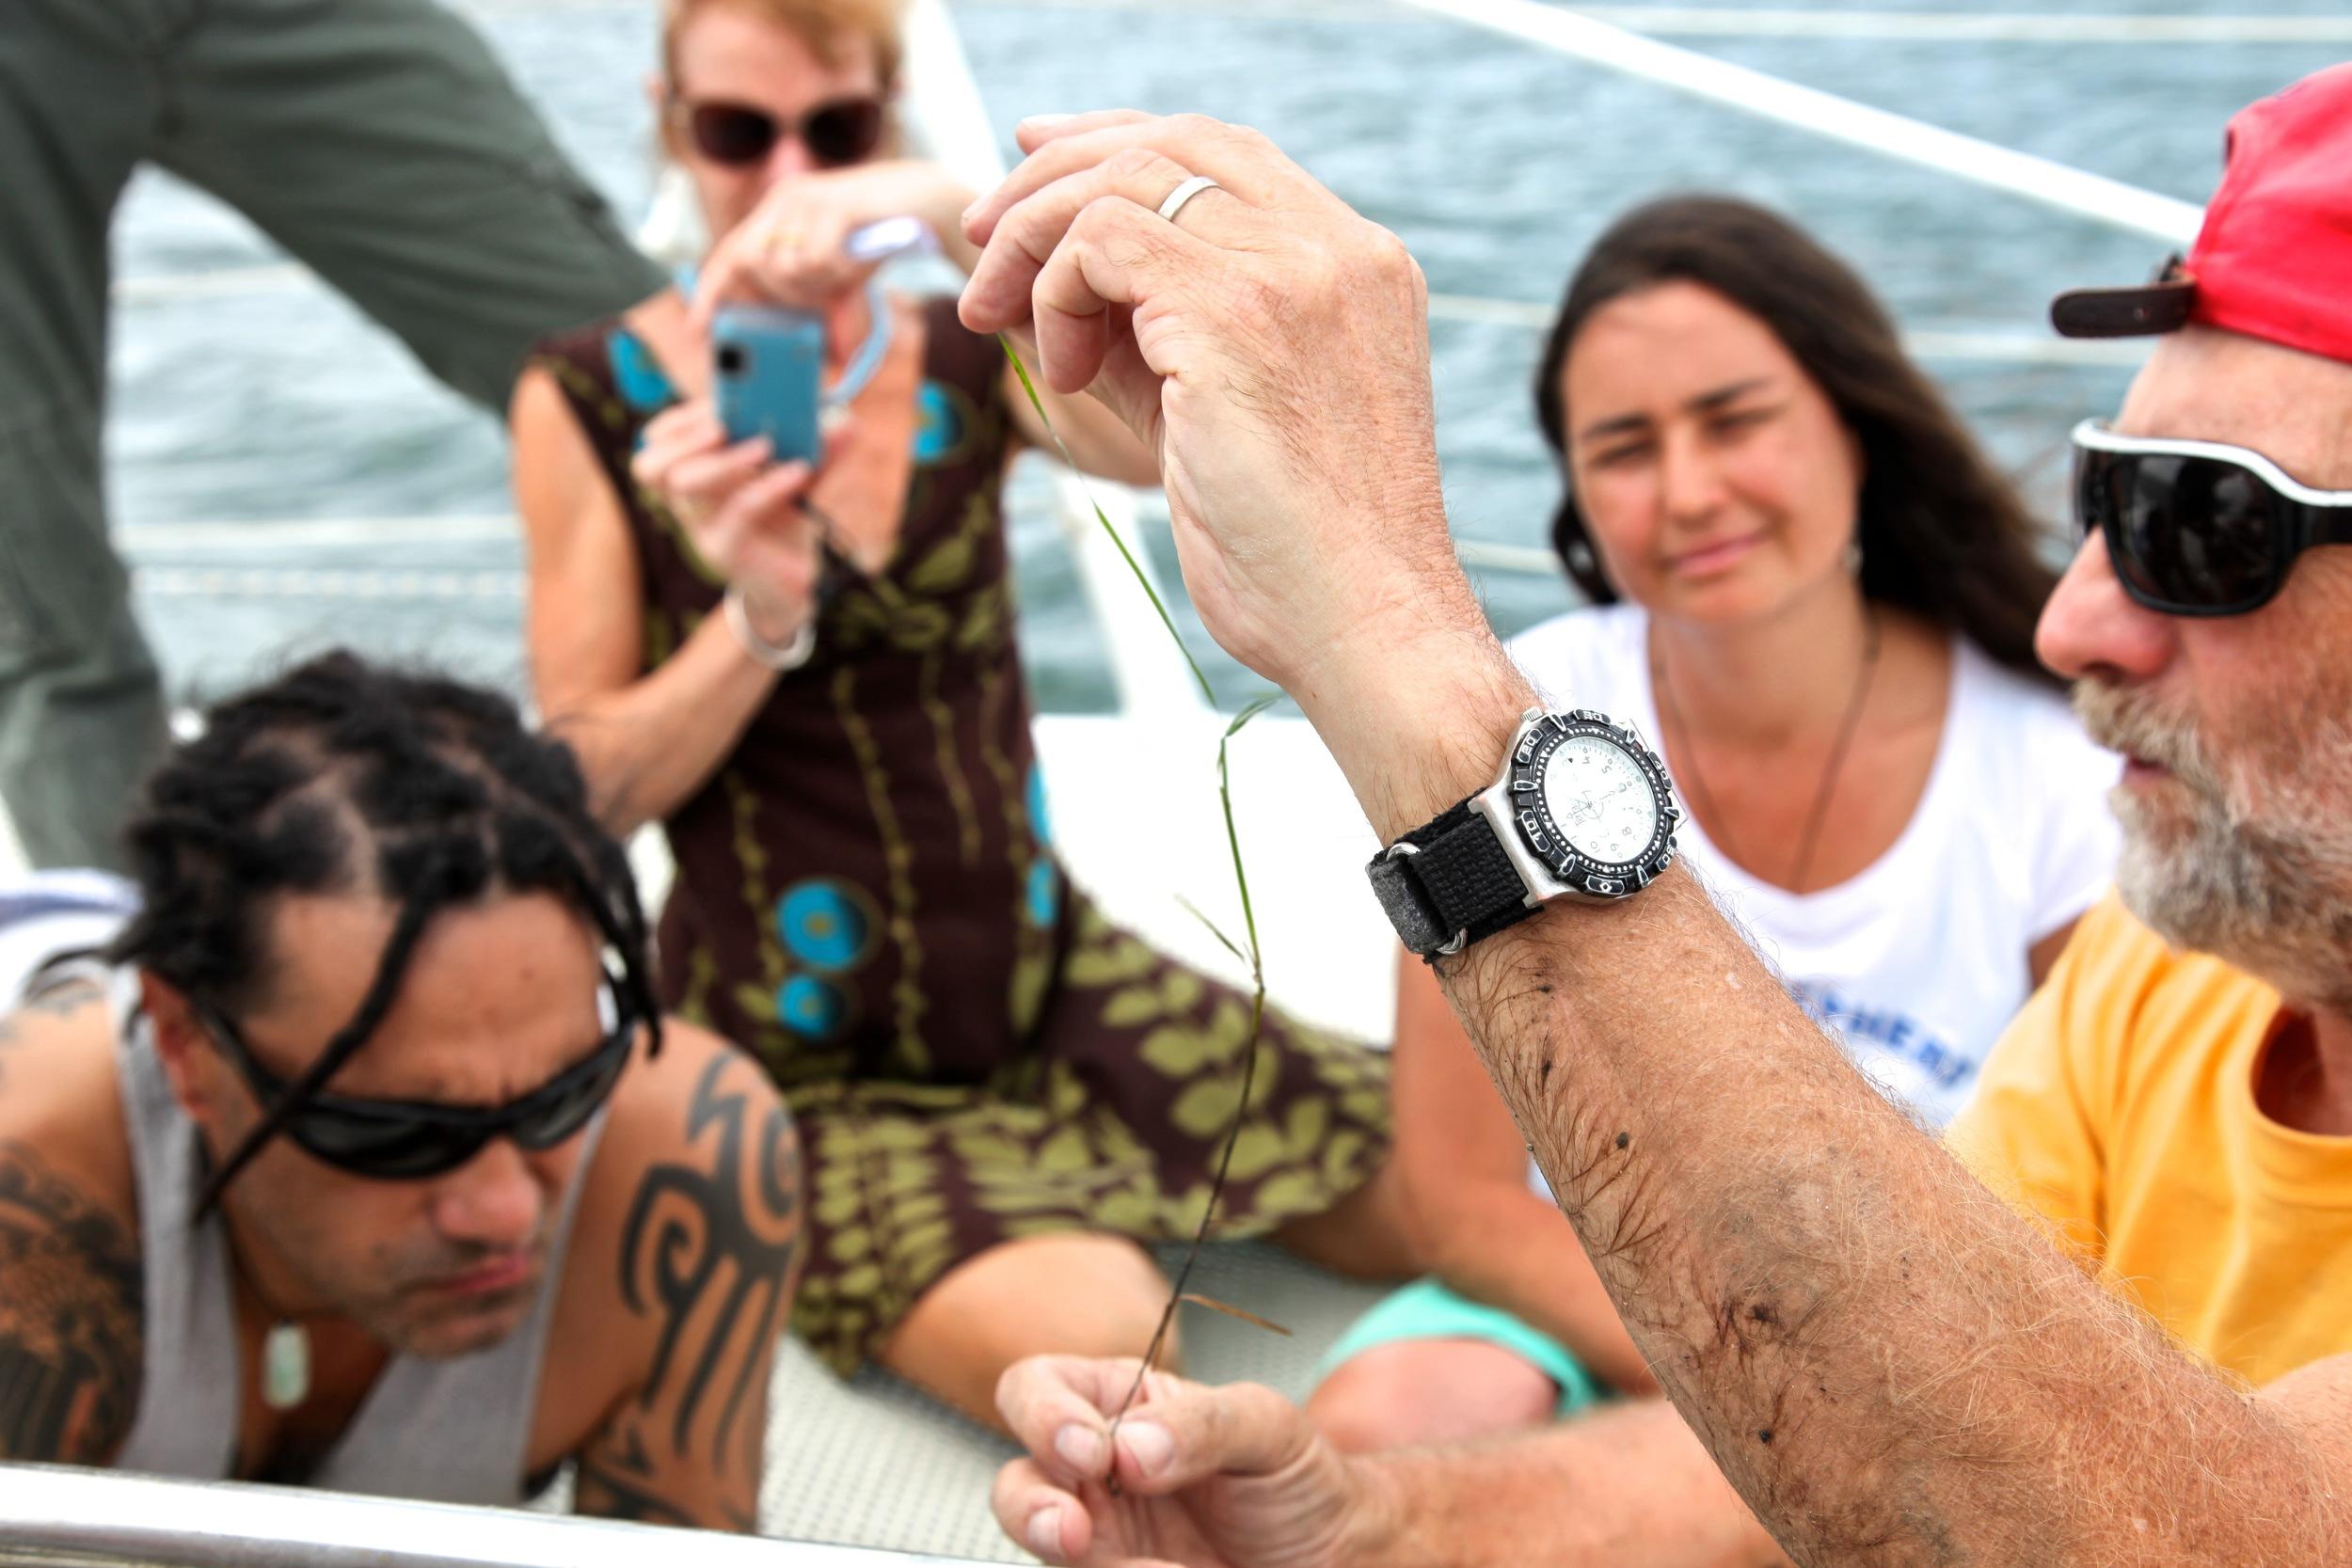 Harry Breidahl, marine educator, teaching on board S.V. Pelican 1 - using the vessel as a classroom at sea.